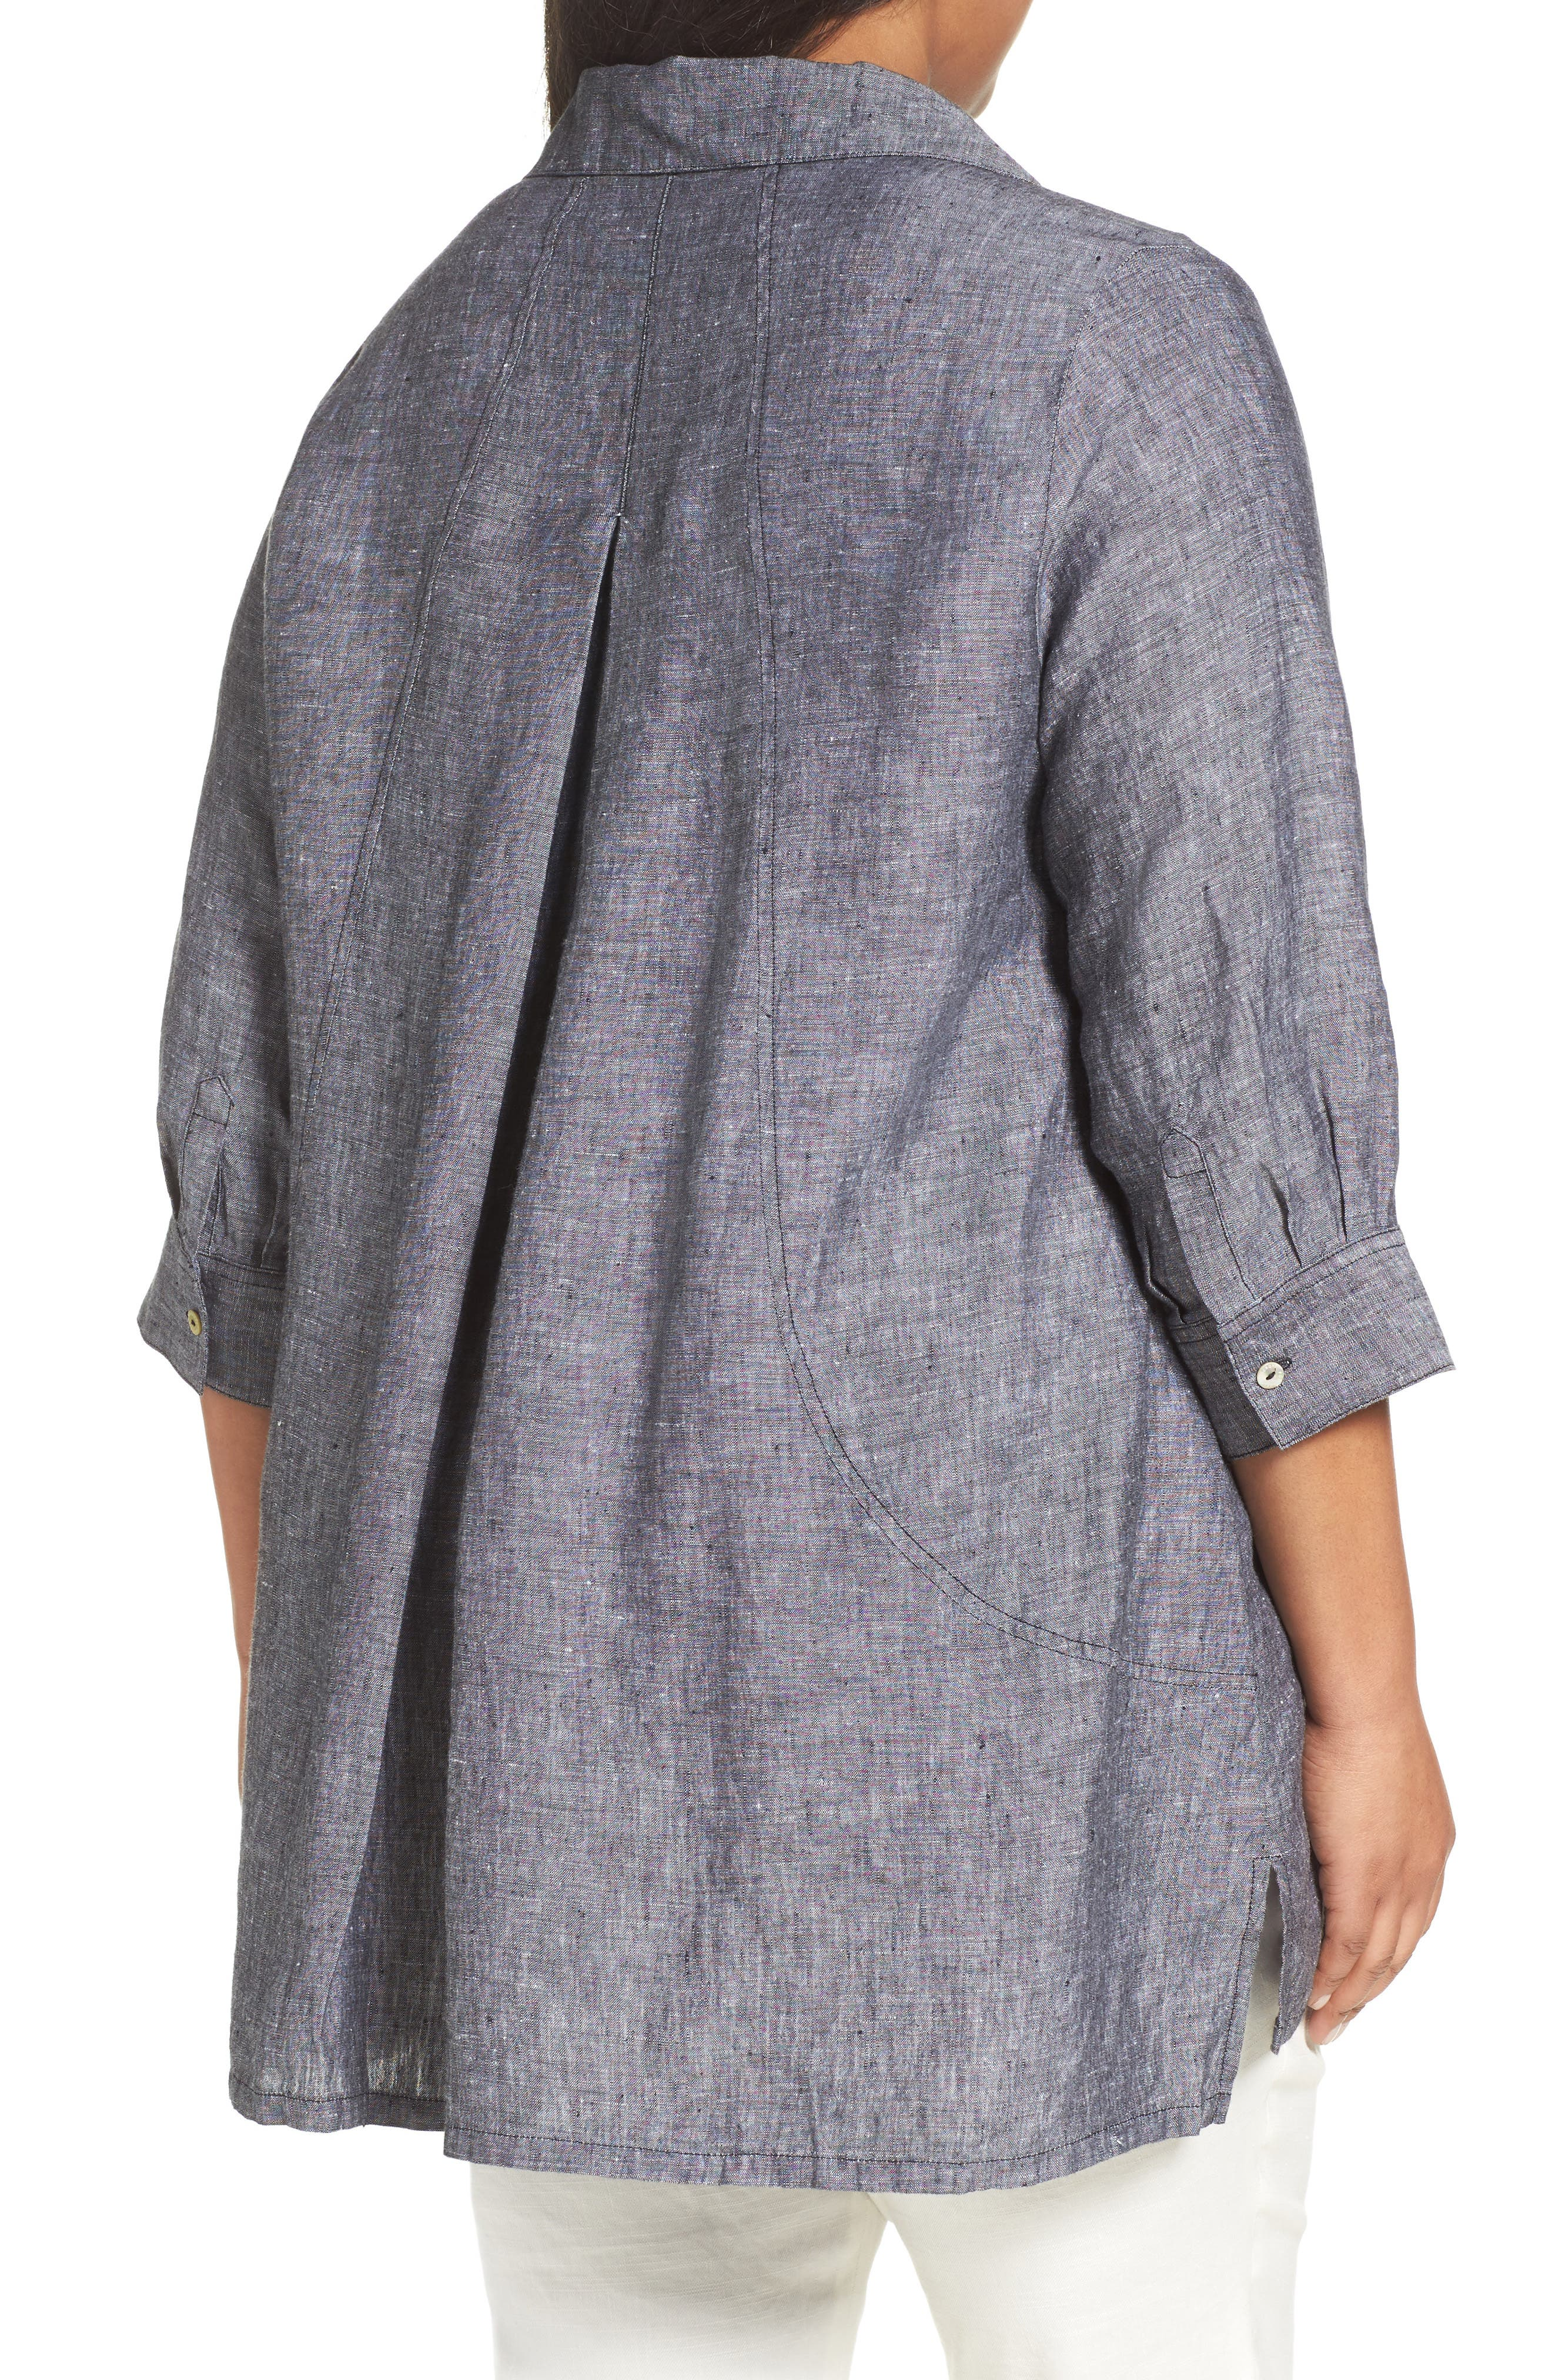 FOXCROFT, Chambray Linen Tunic Shirt, Alternate thumbnail 2, color, BLACK